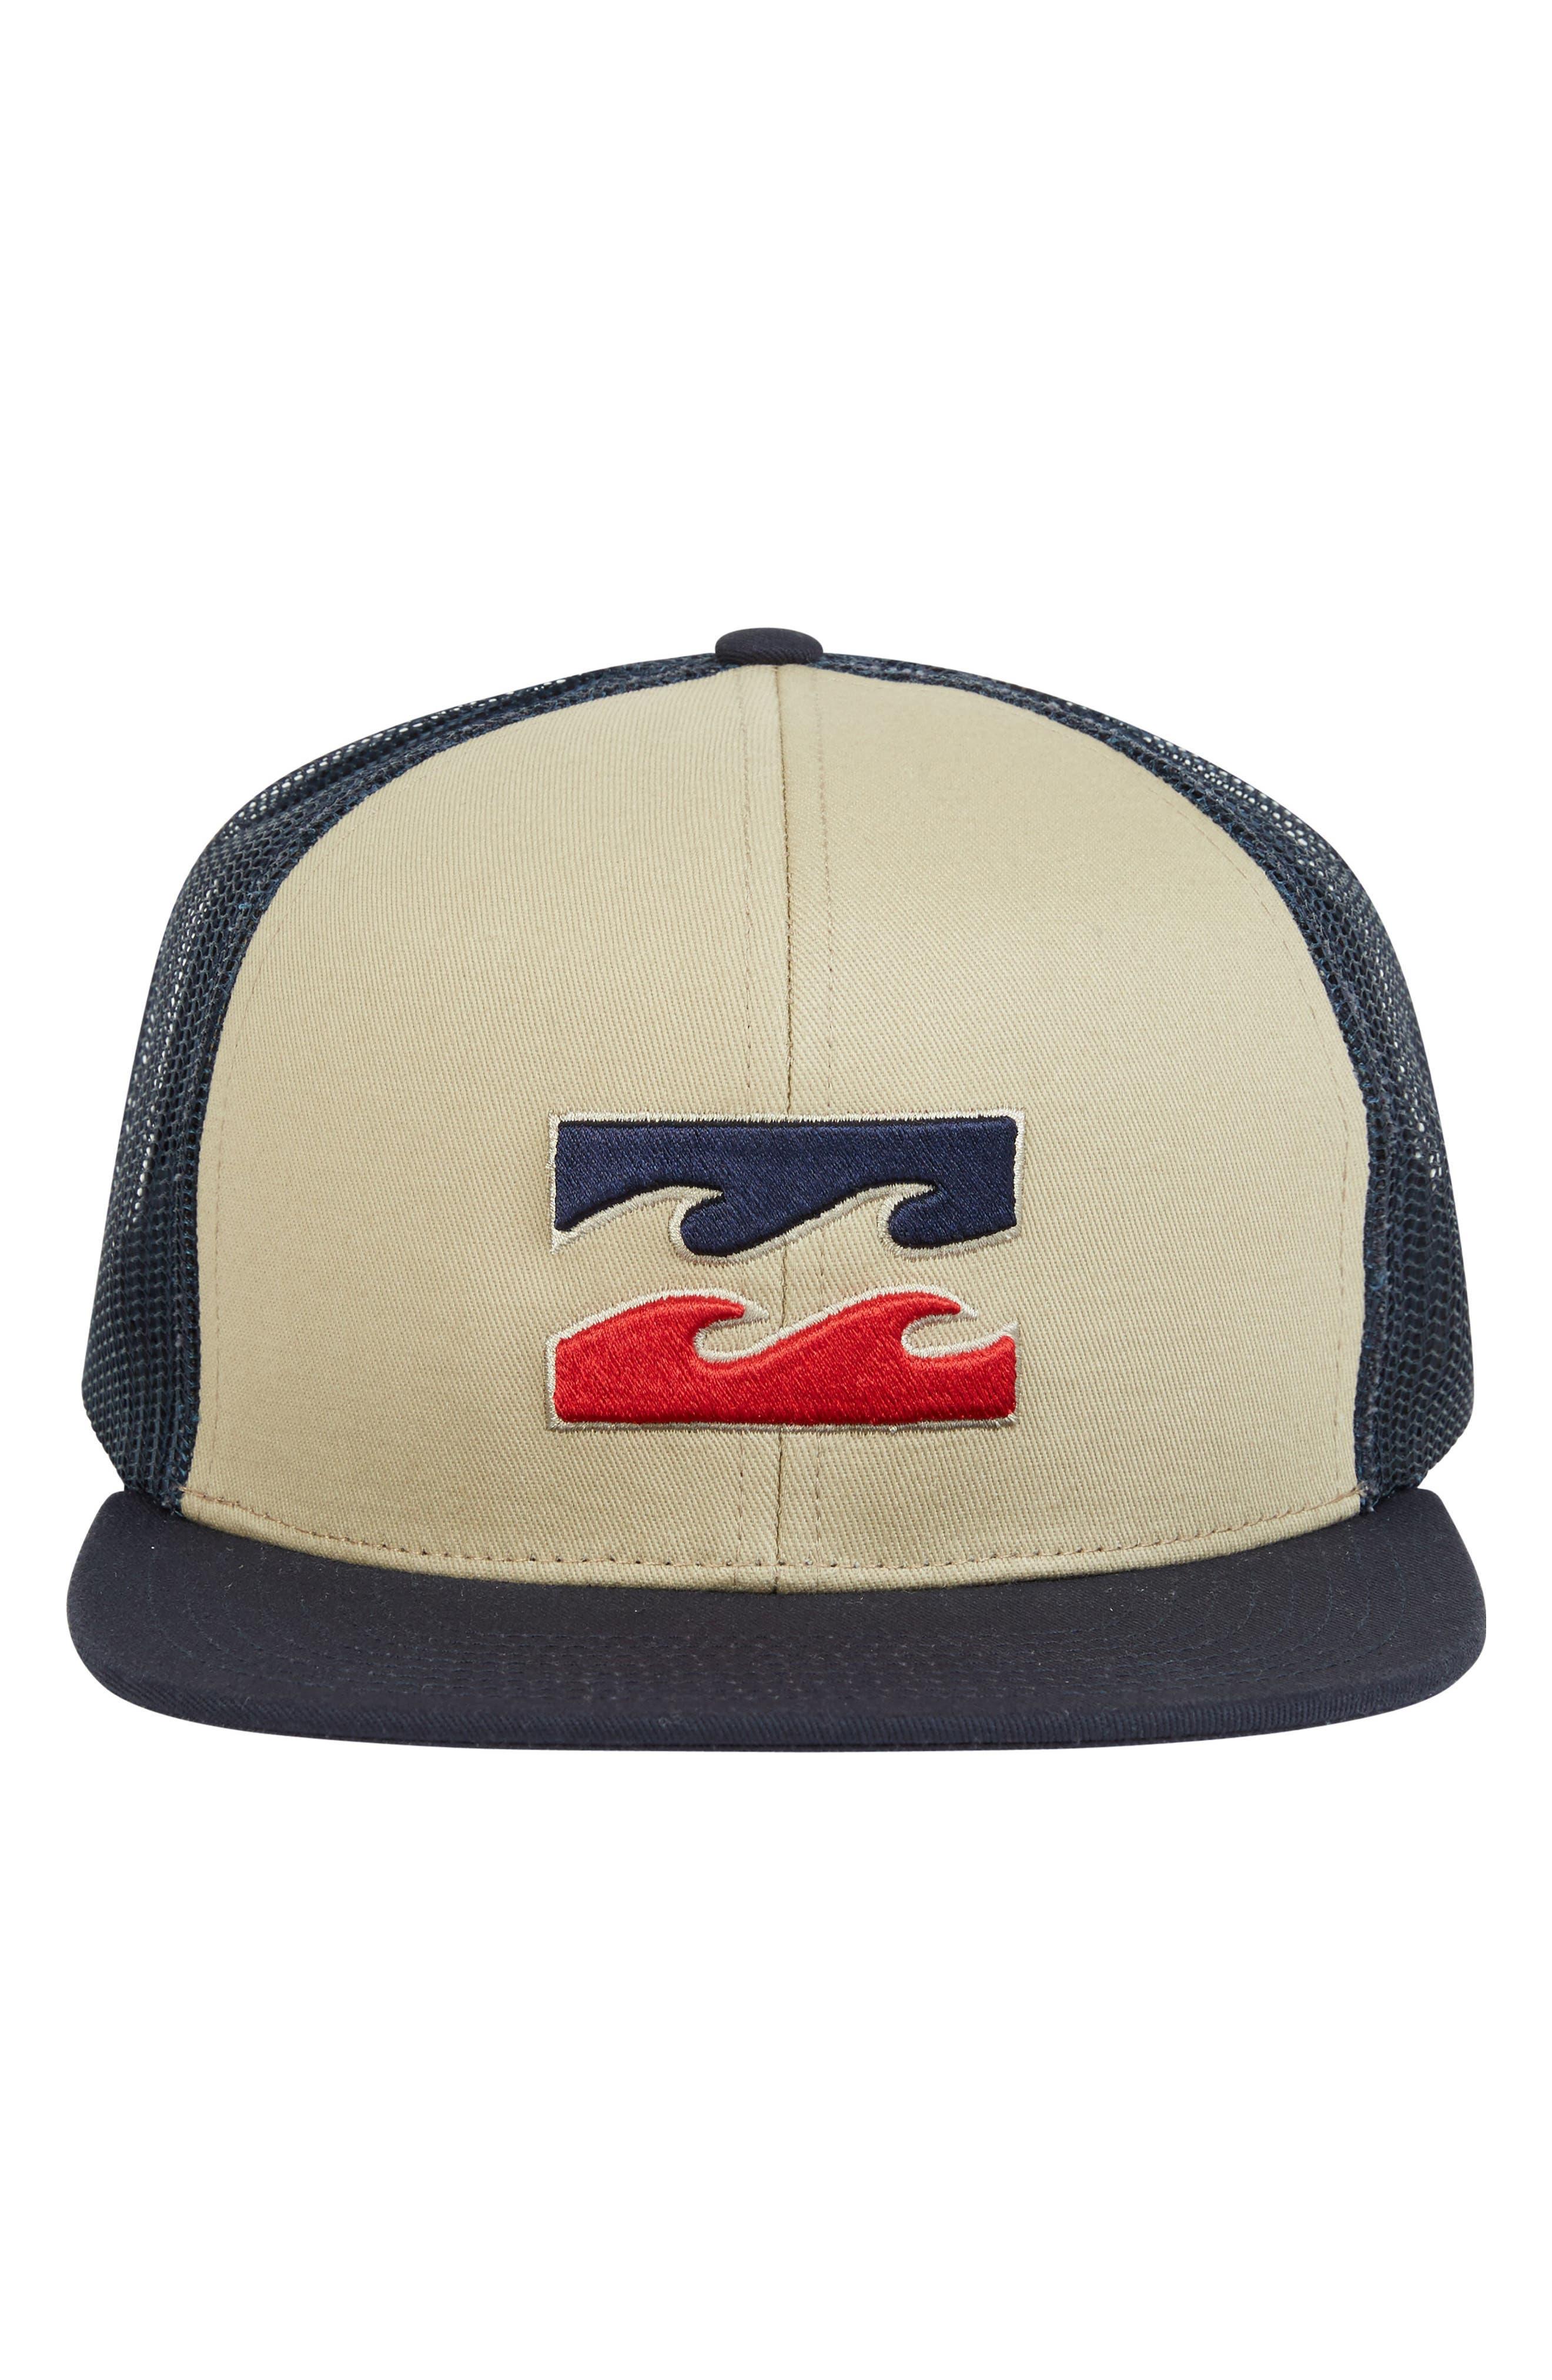 All Day Trucker Hat,                             Alternate thumbnail 12, color,